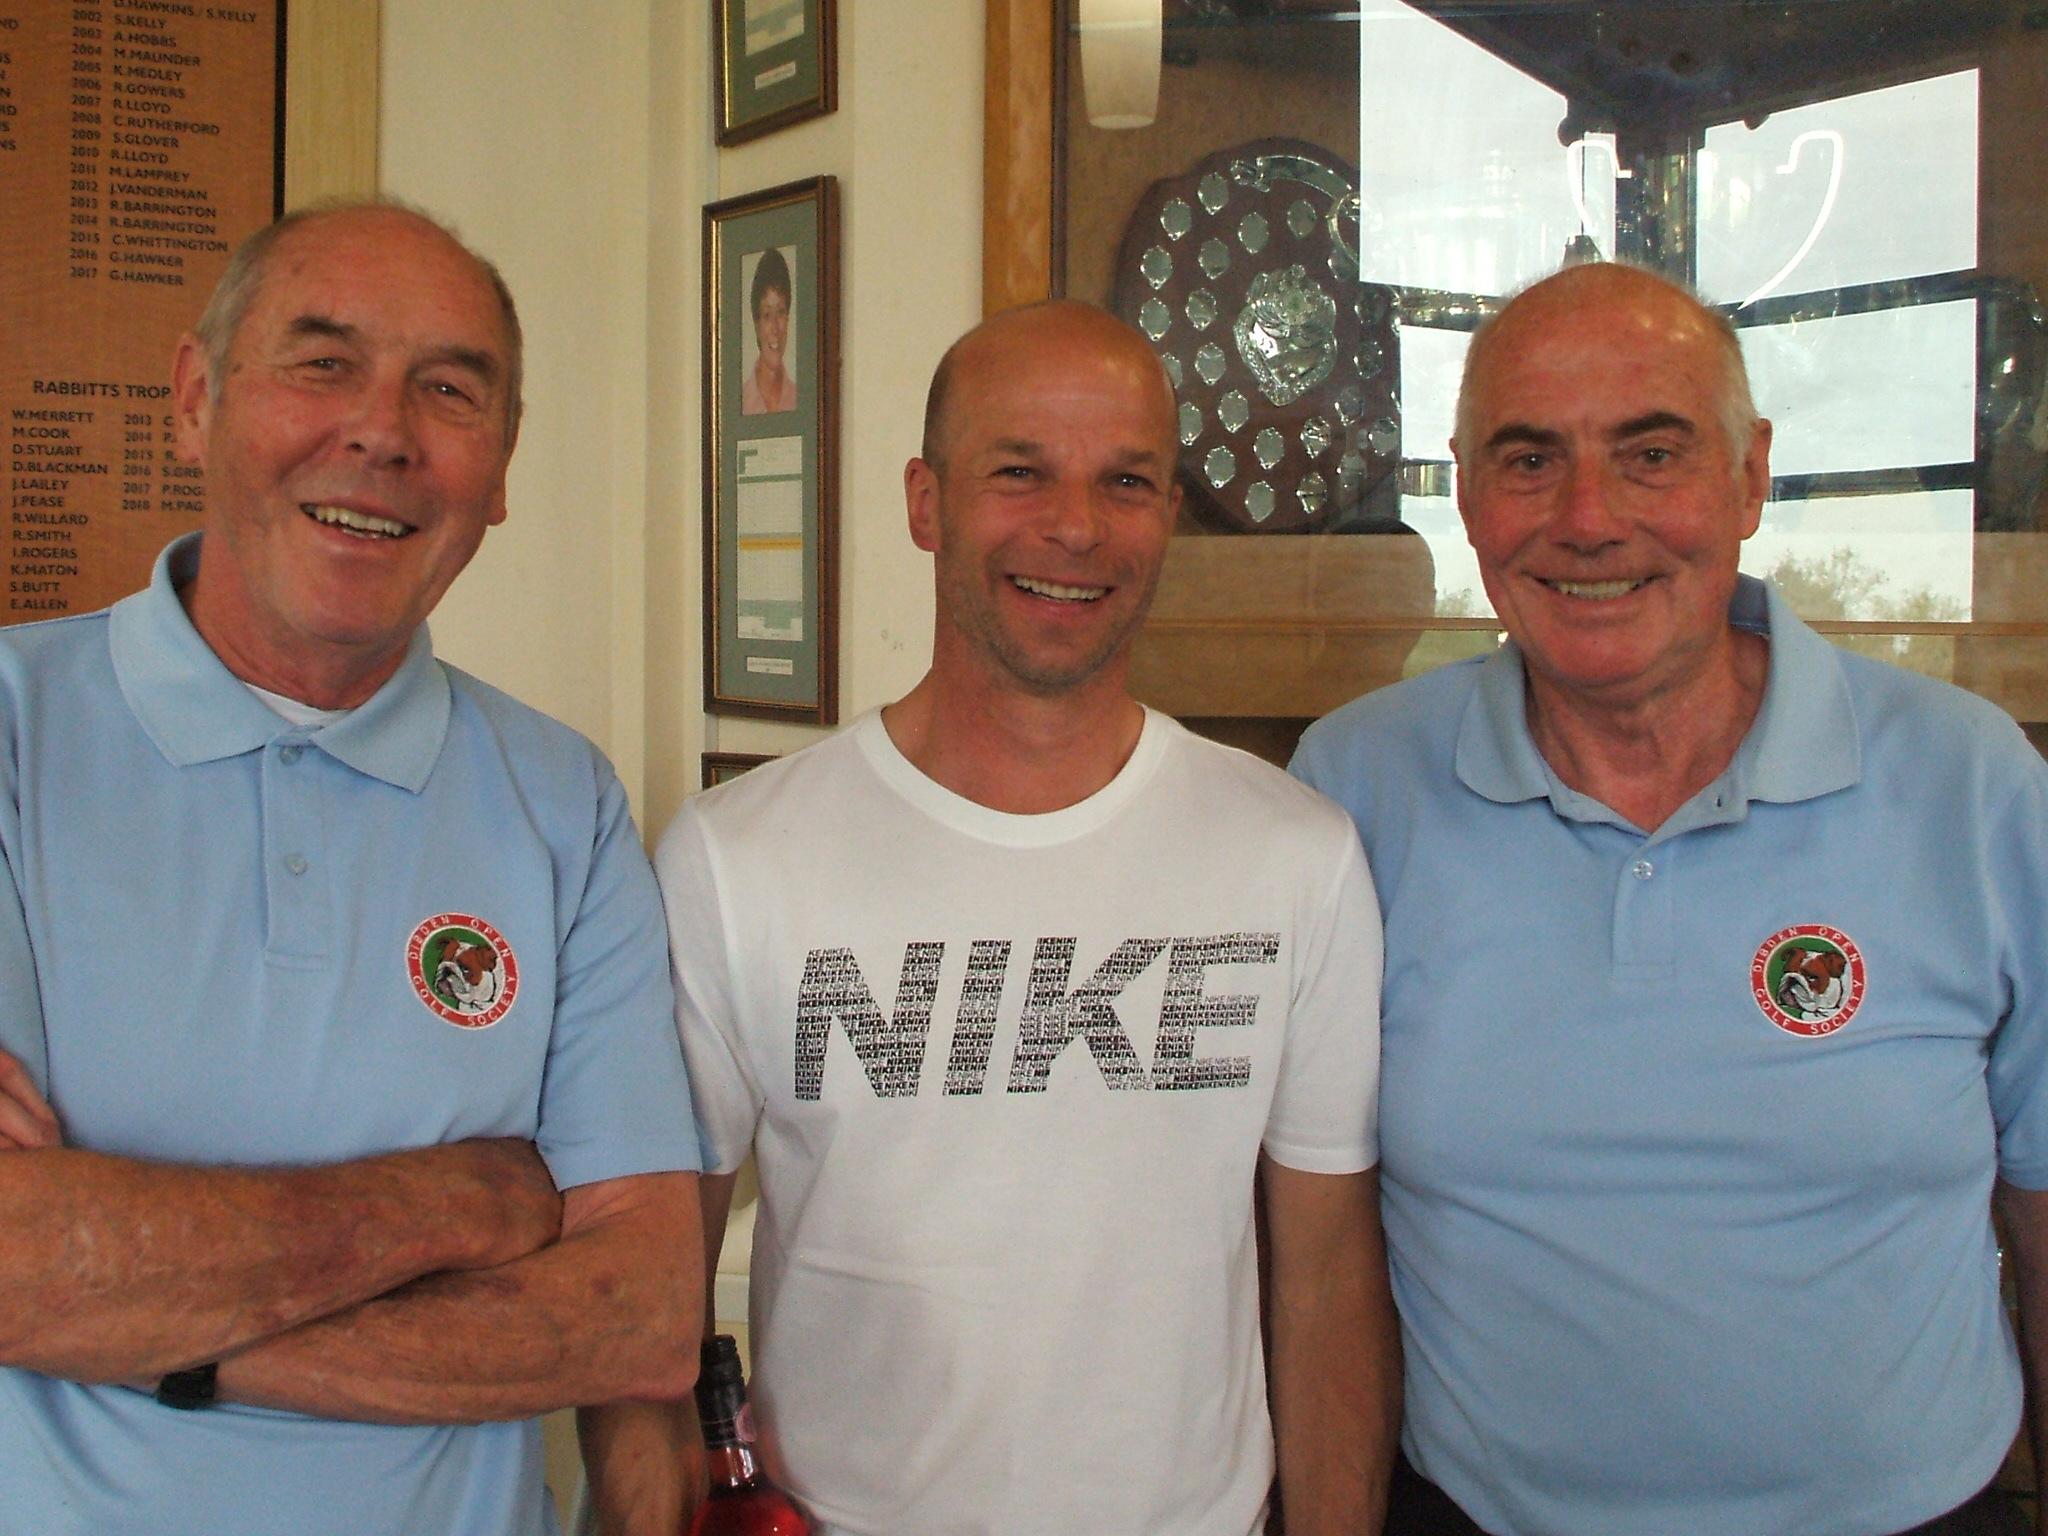 23 April: 18 hole winners L to R Ken Barge; Paul Pallaster; Ian Cameron